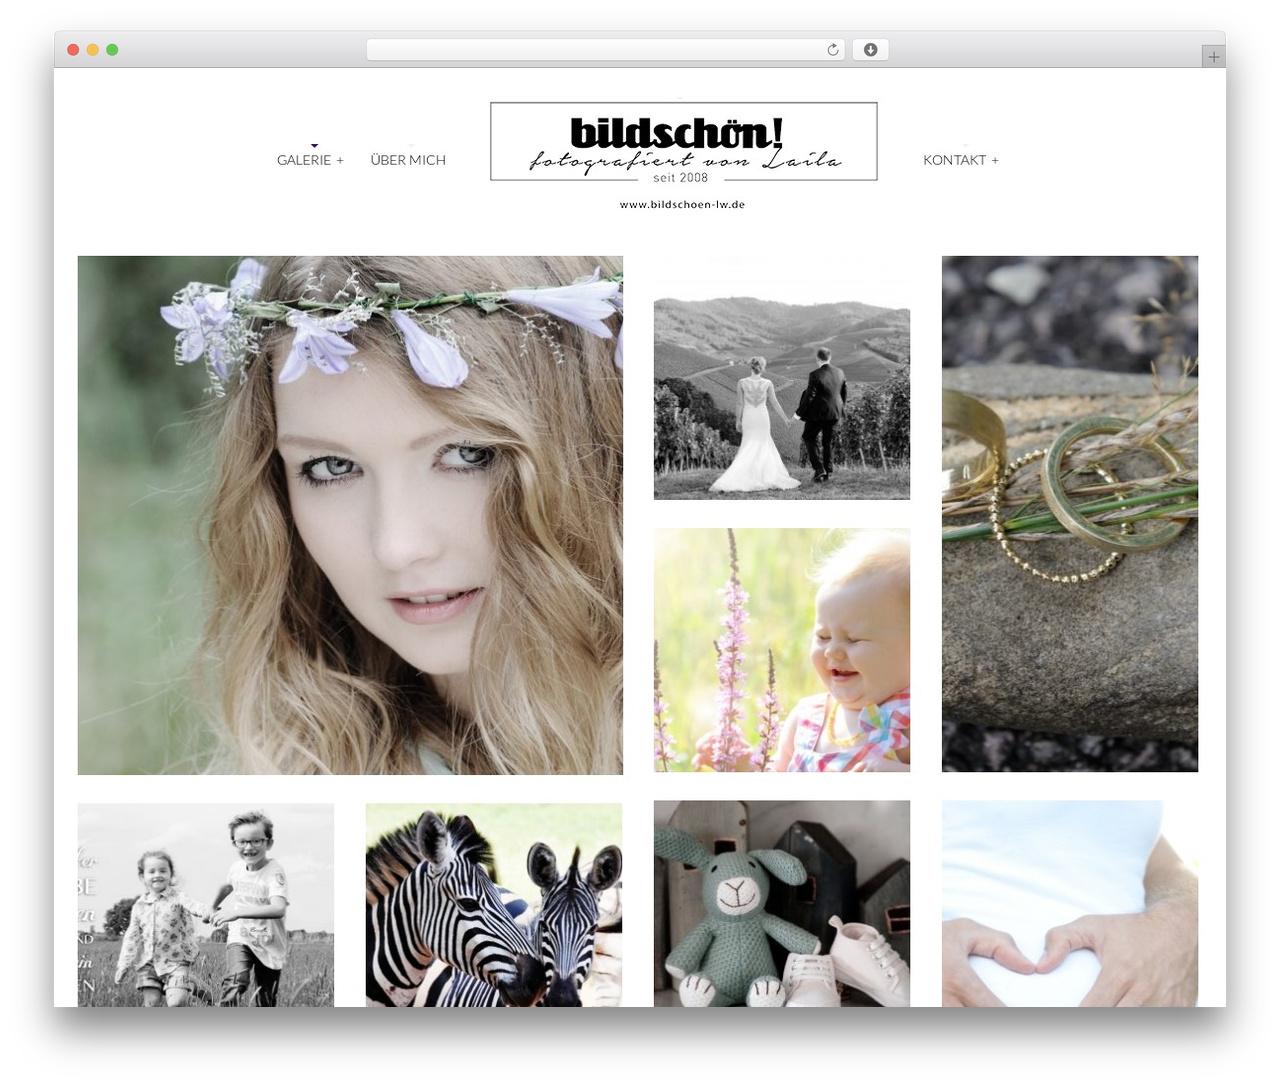 WordPress website template Tripod - bildschoen-lw.de